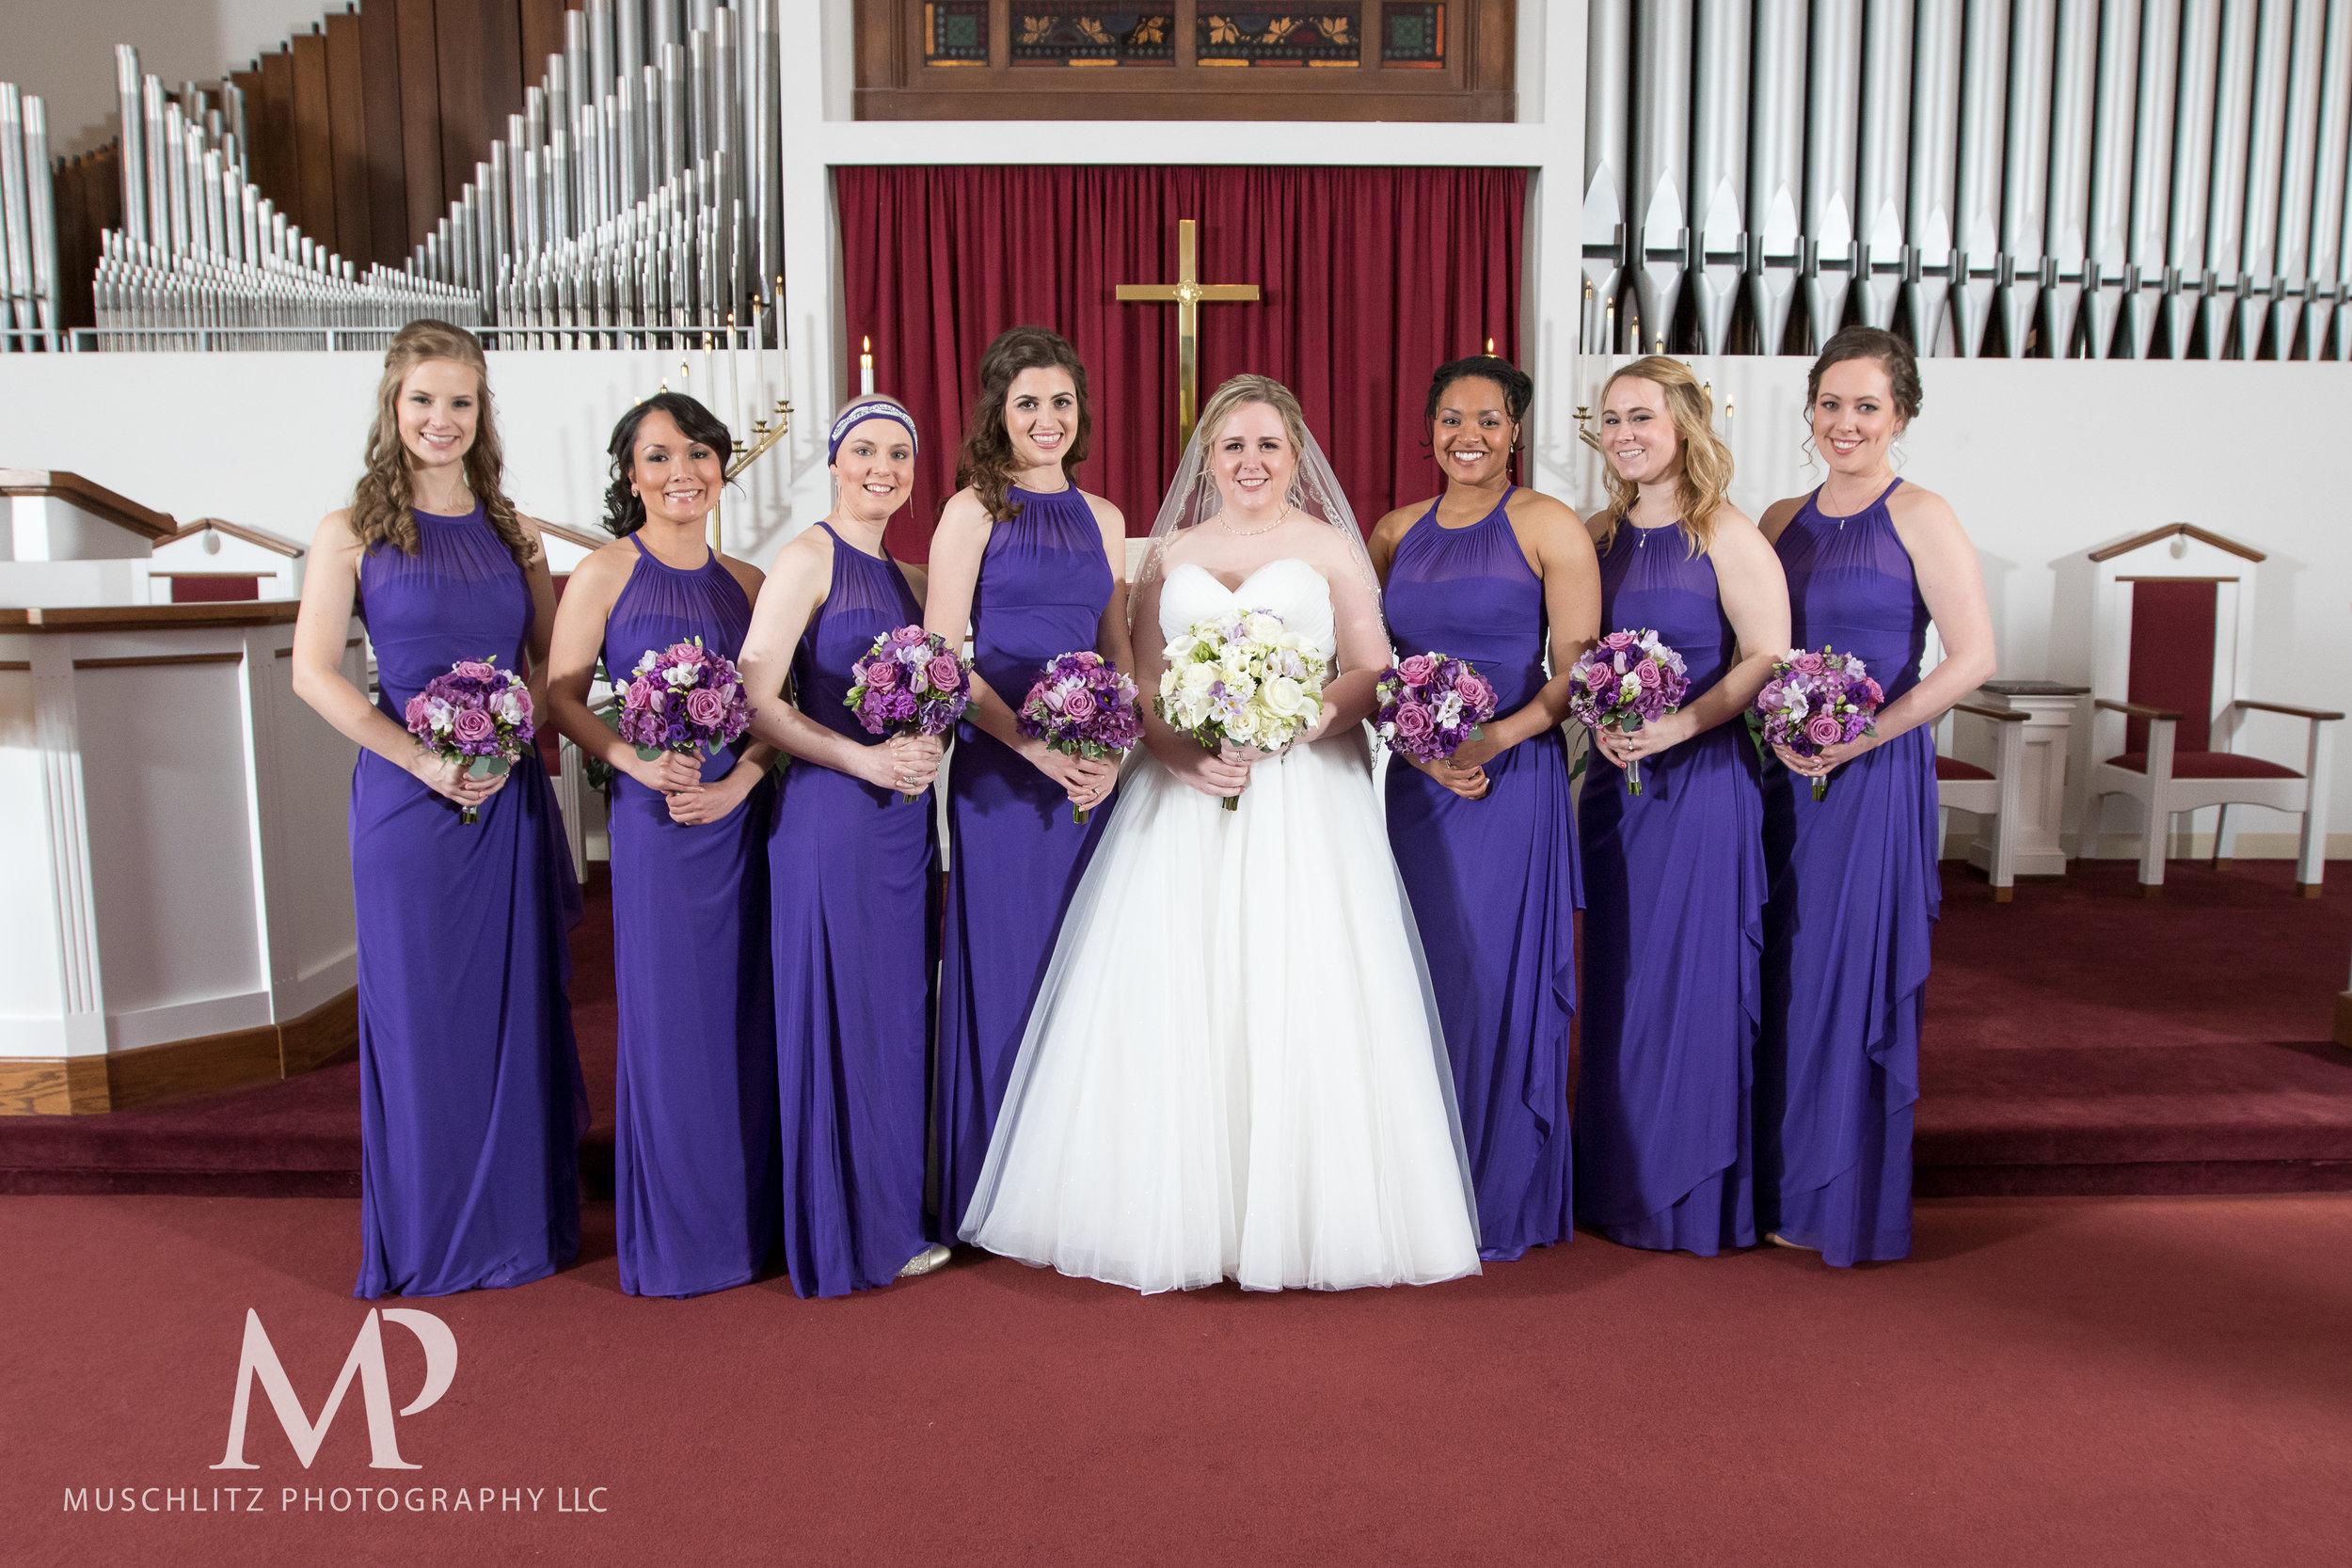 dublin-community-church-wedding-columbus-ohio-muschlitz-photography-068.JPG